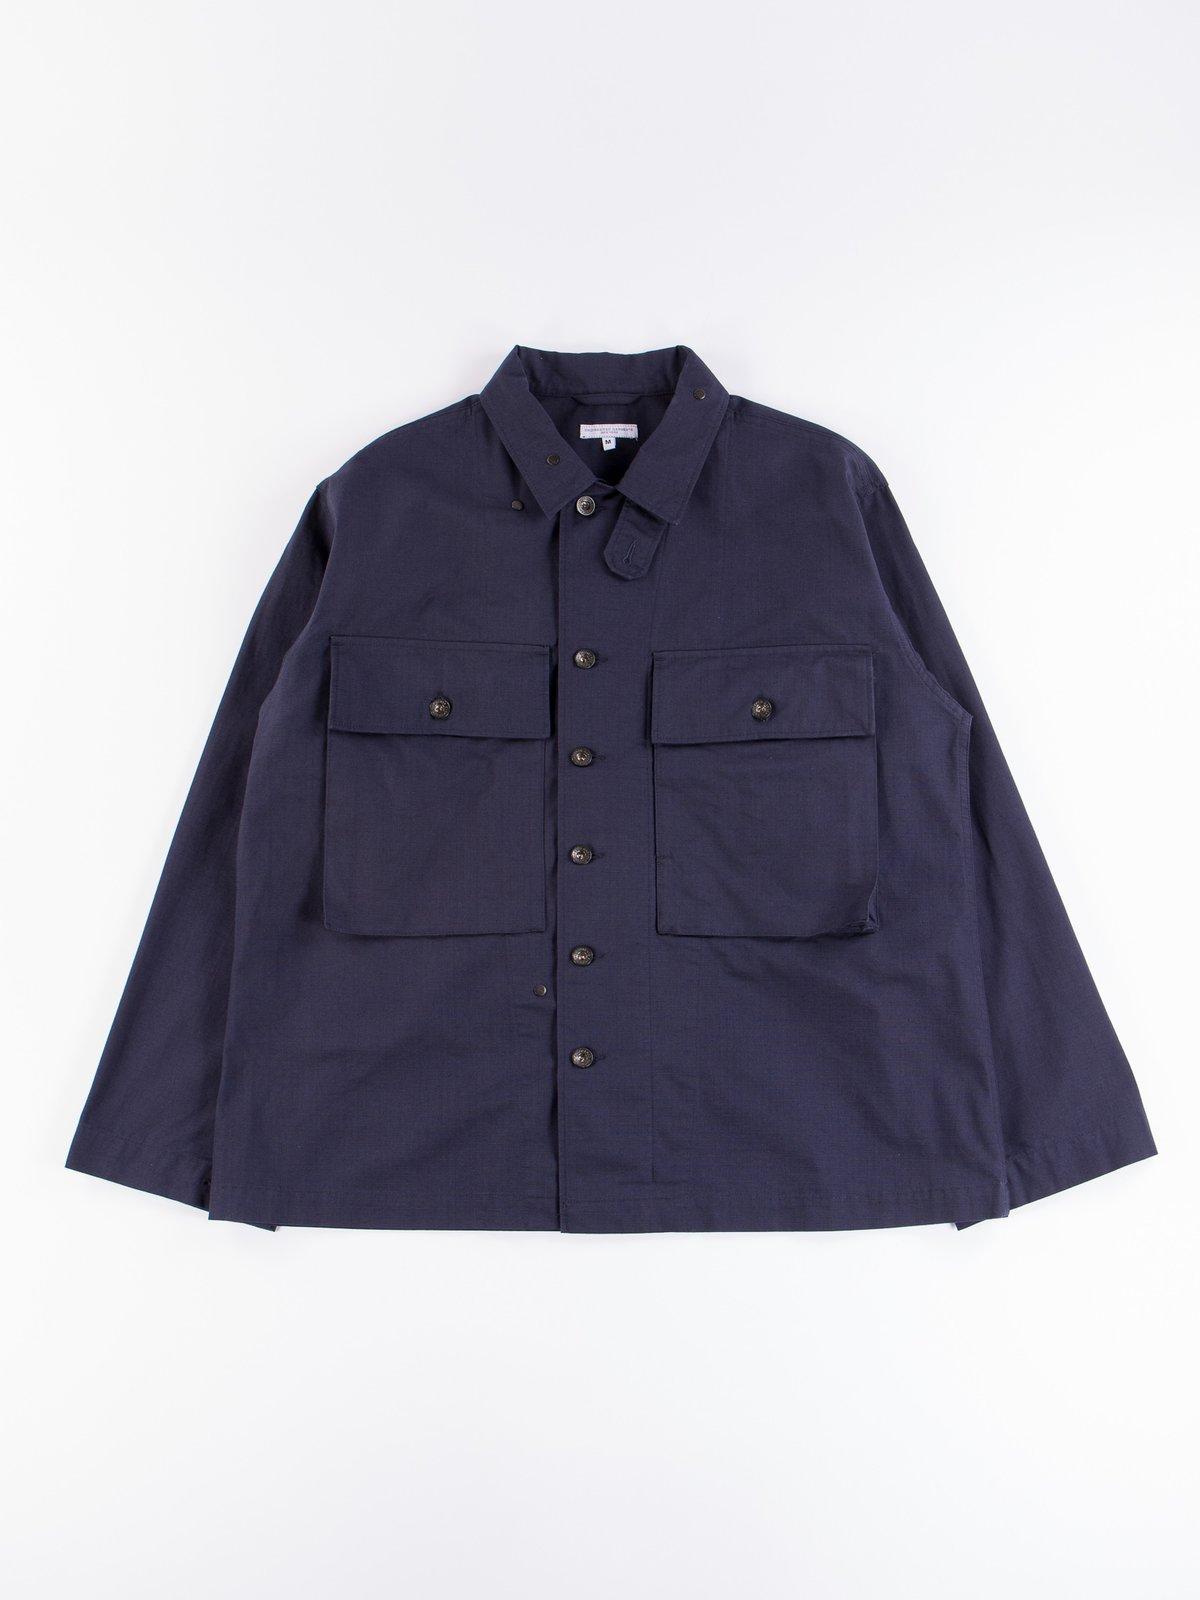 Dark Navy Cotton Ripstop M43/2 Shirt Jacket - Image 1